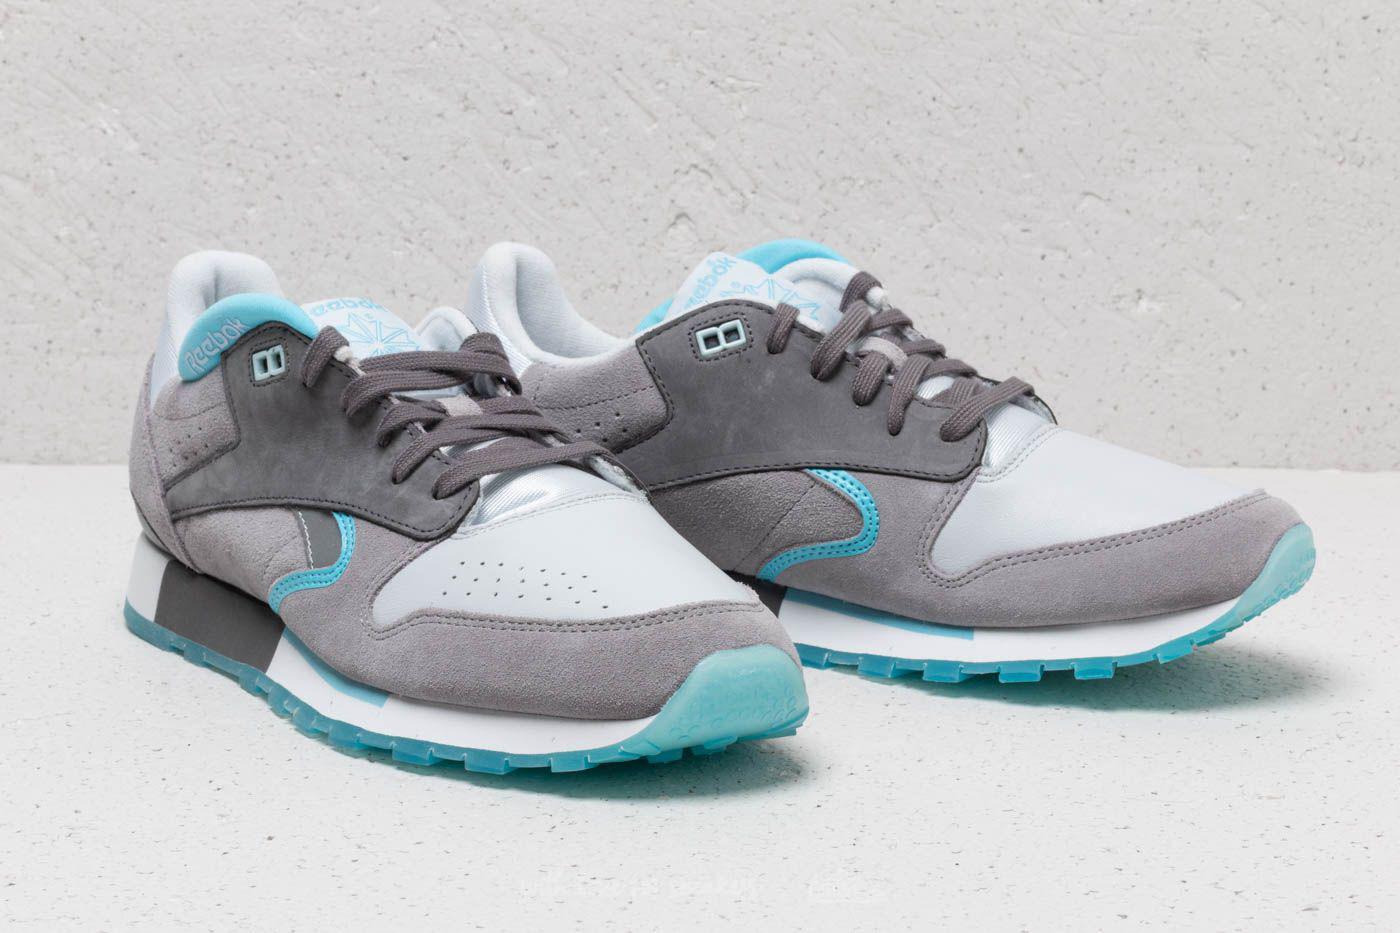 Lyst - Reebok Leather Urge White  Grey  Digital Blue for Men 25c9c6901